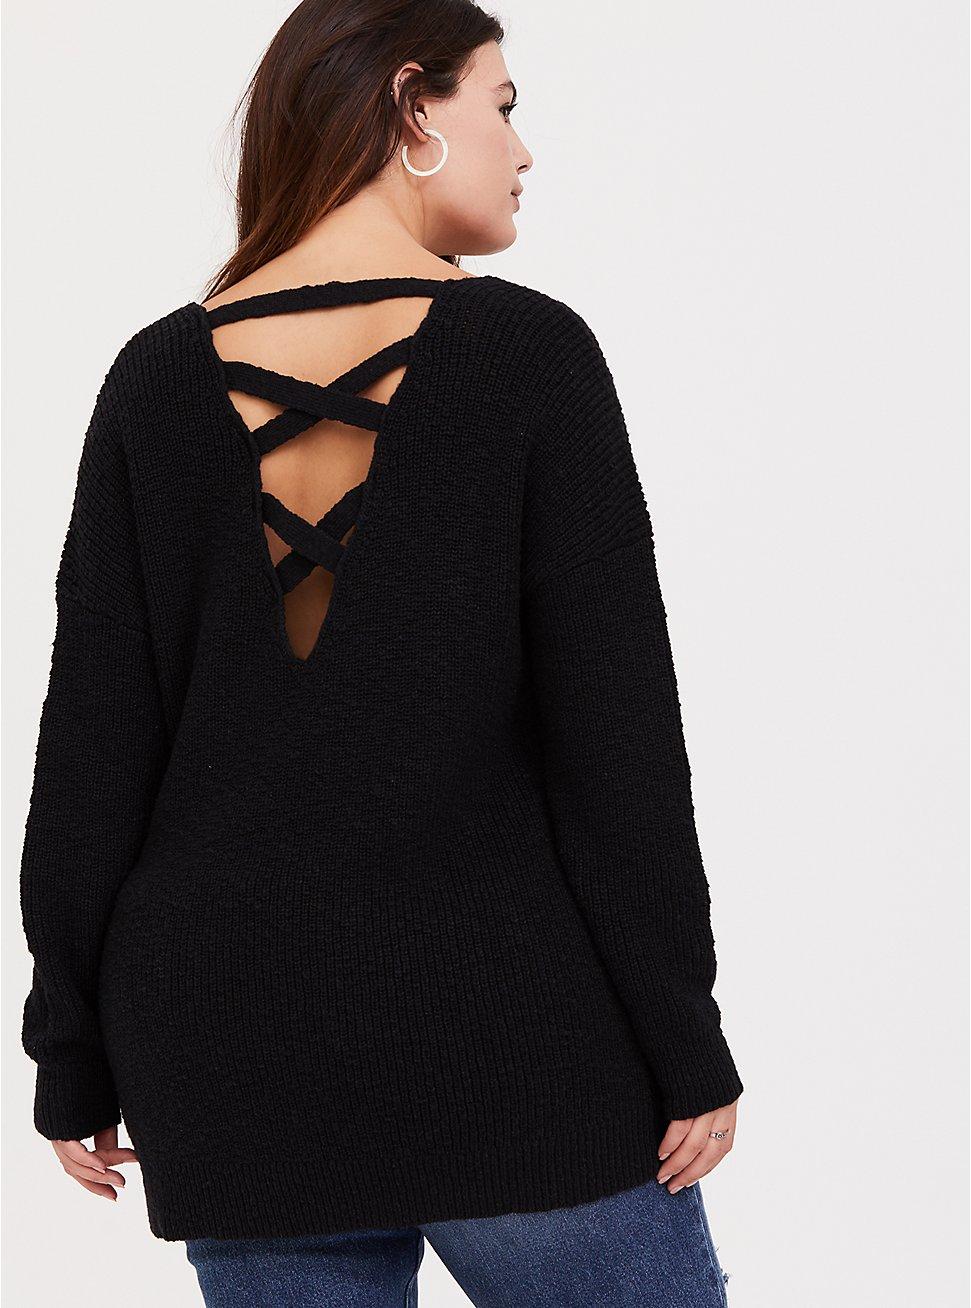 Black Crisscross Back Tunic Sweater, DEEP BLACK, hi-res